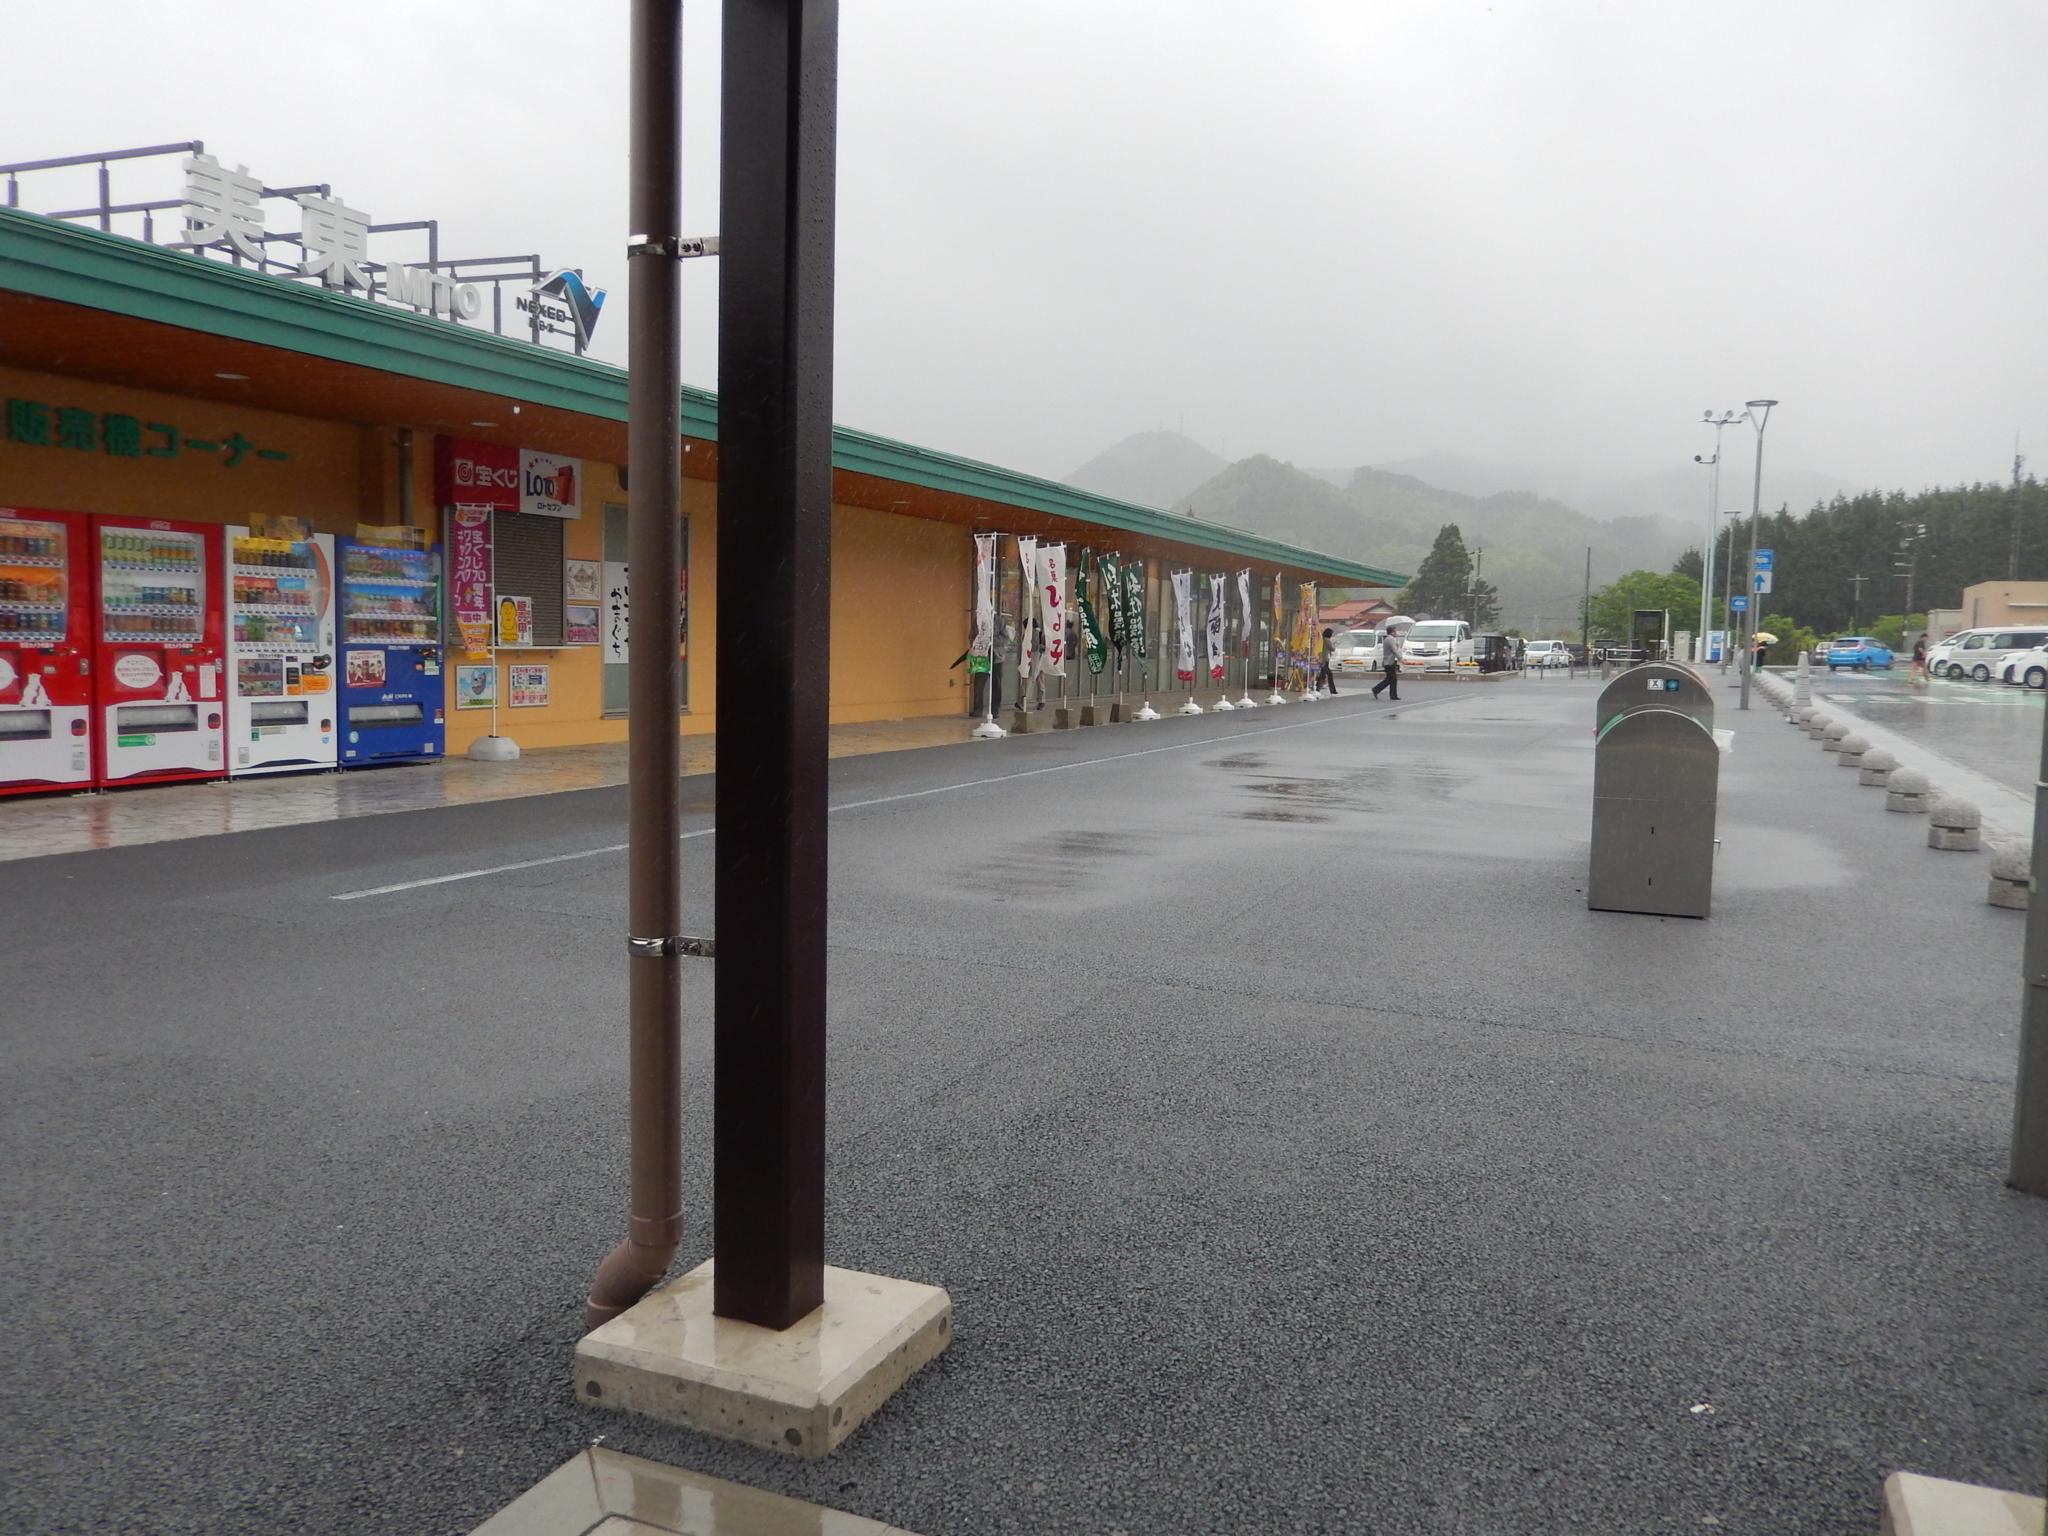 f:id:ToshUeno:20150503135309j:plain